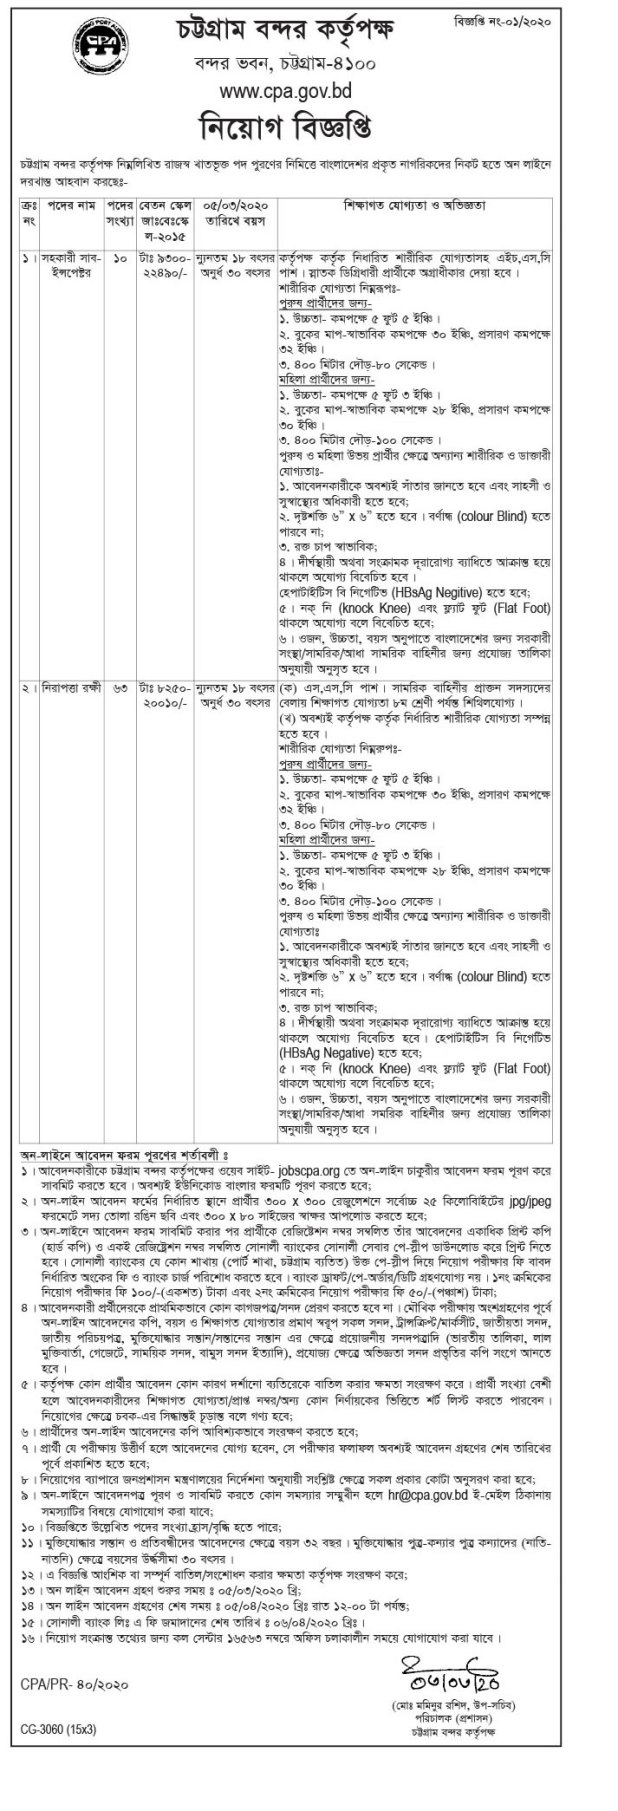 Chittagong Port Authority Job Circular 2020